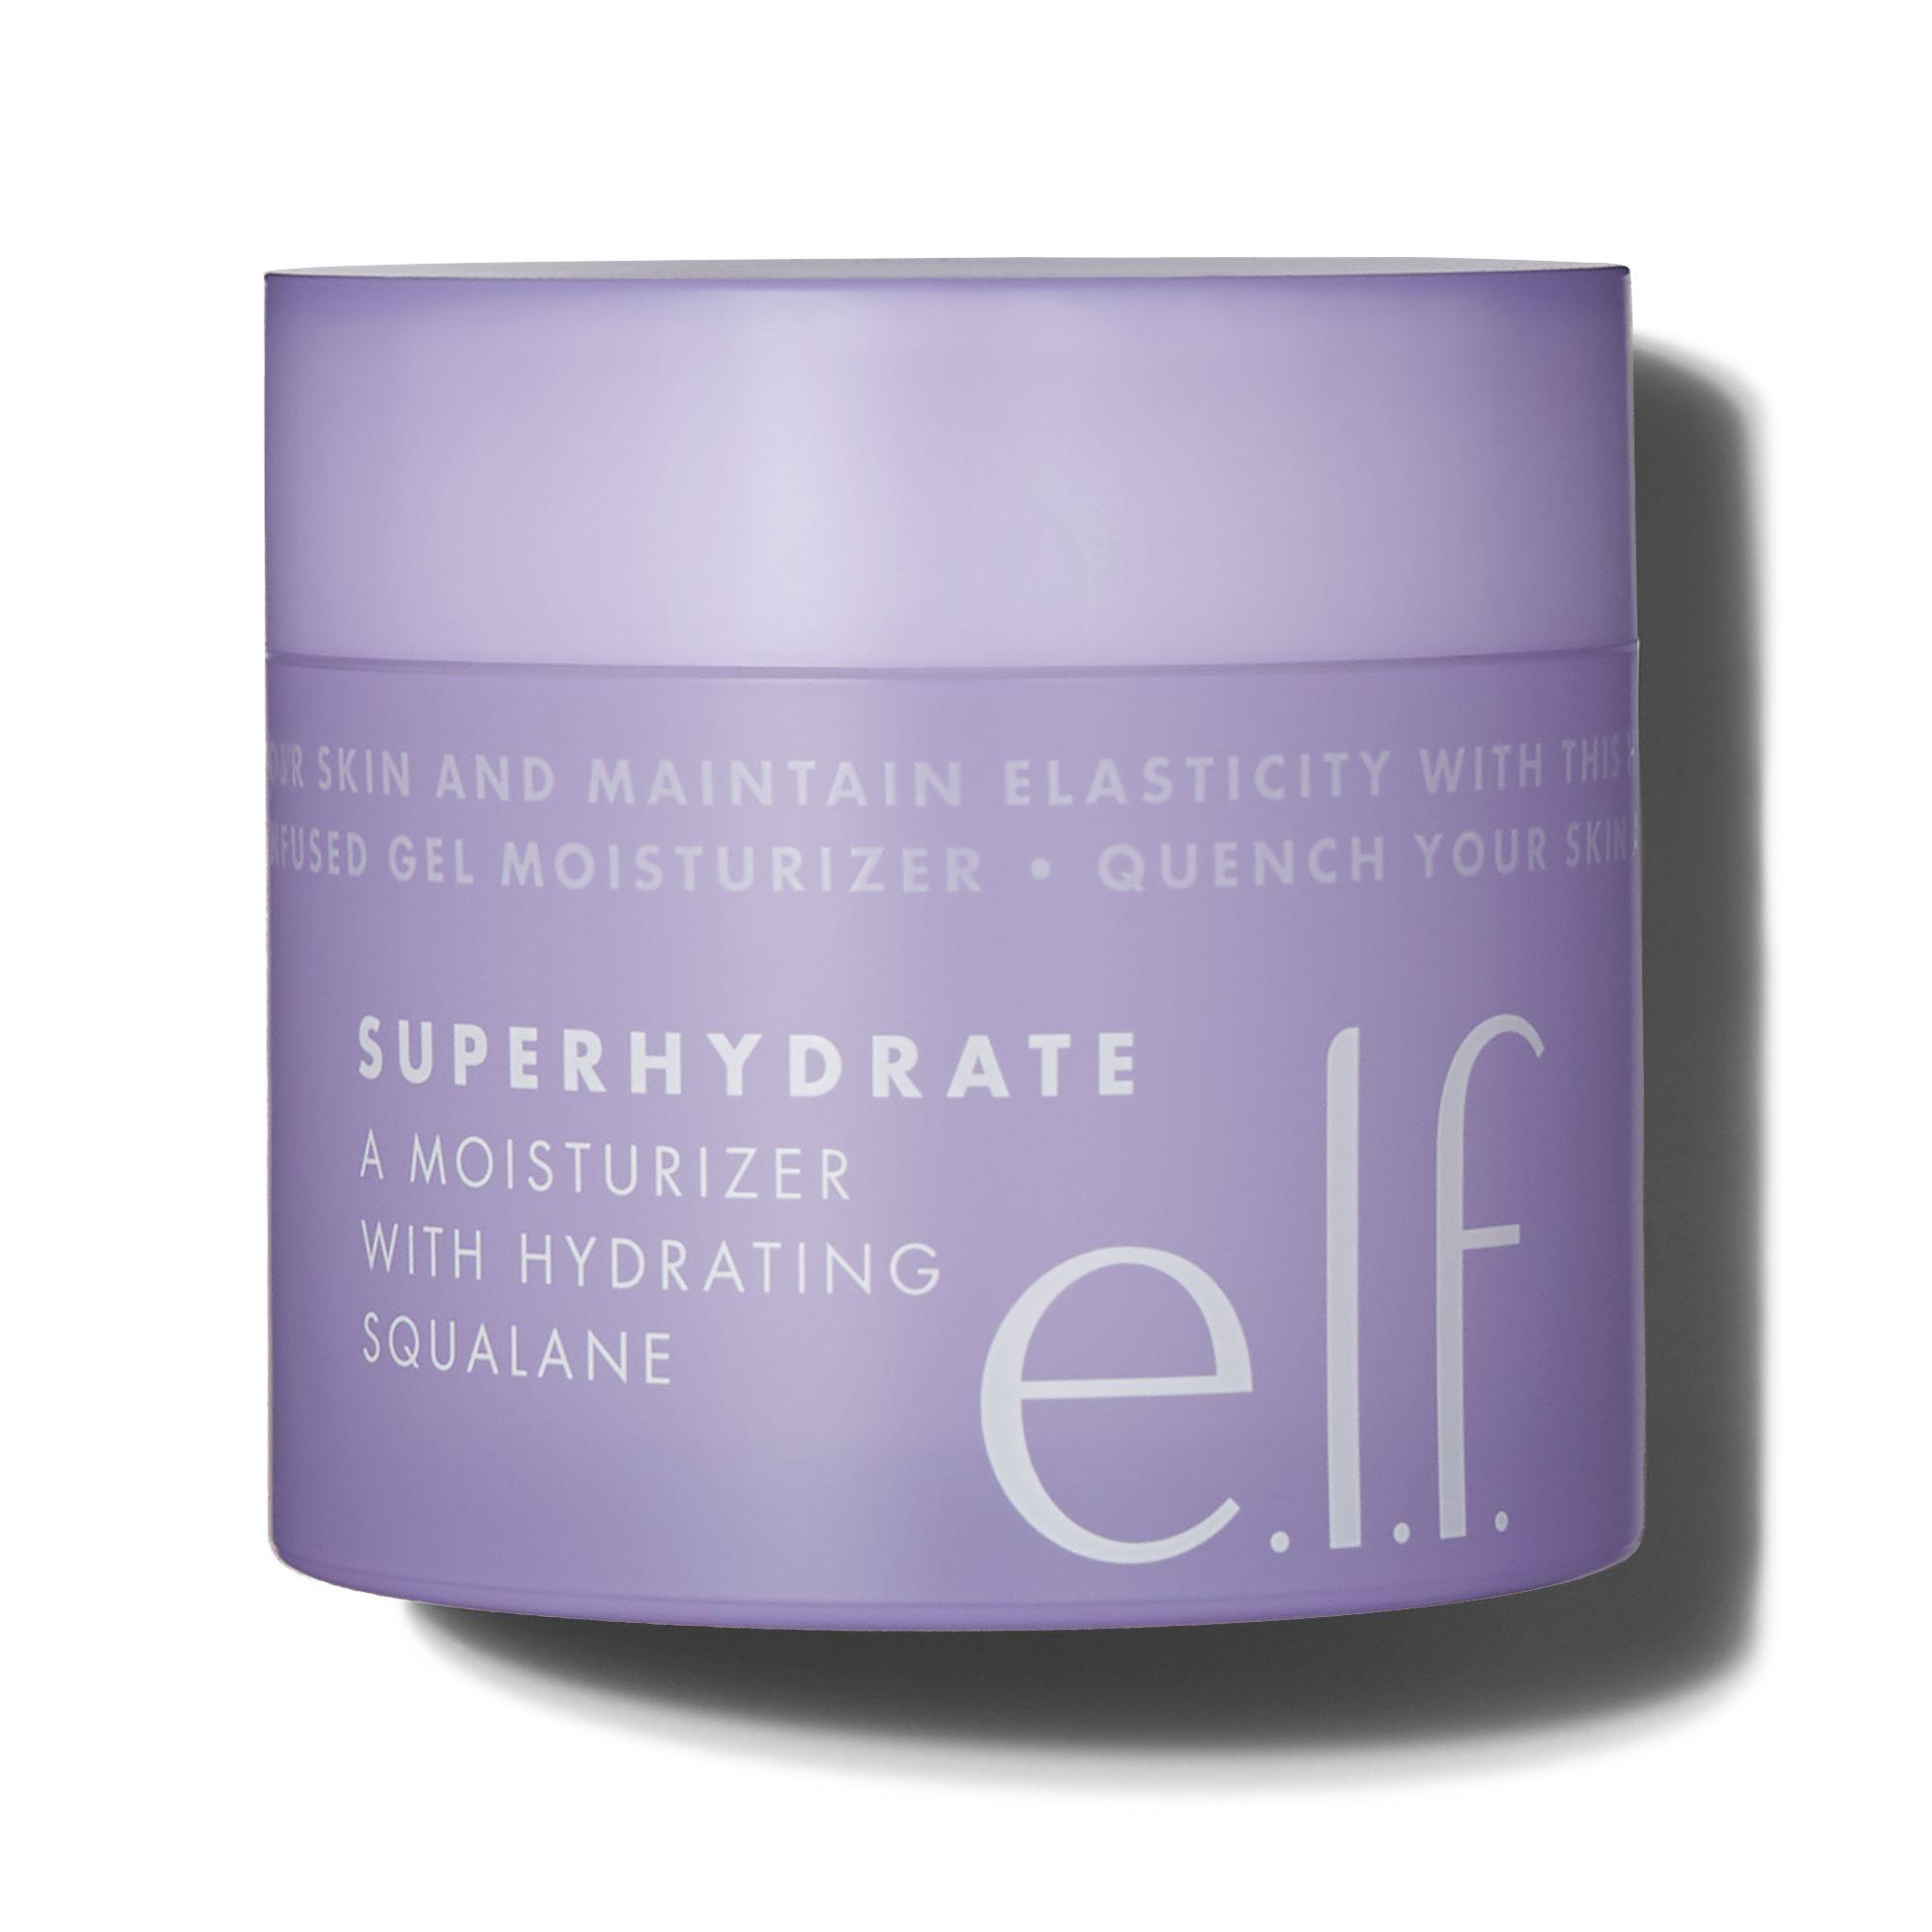 e.l.f. Cosmetics Superhydrate Moisturizer